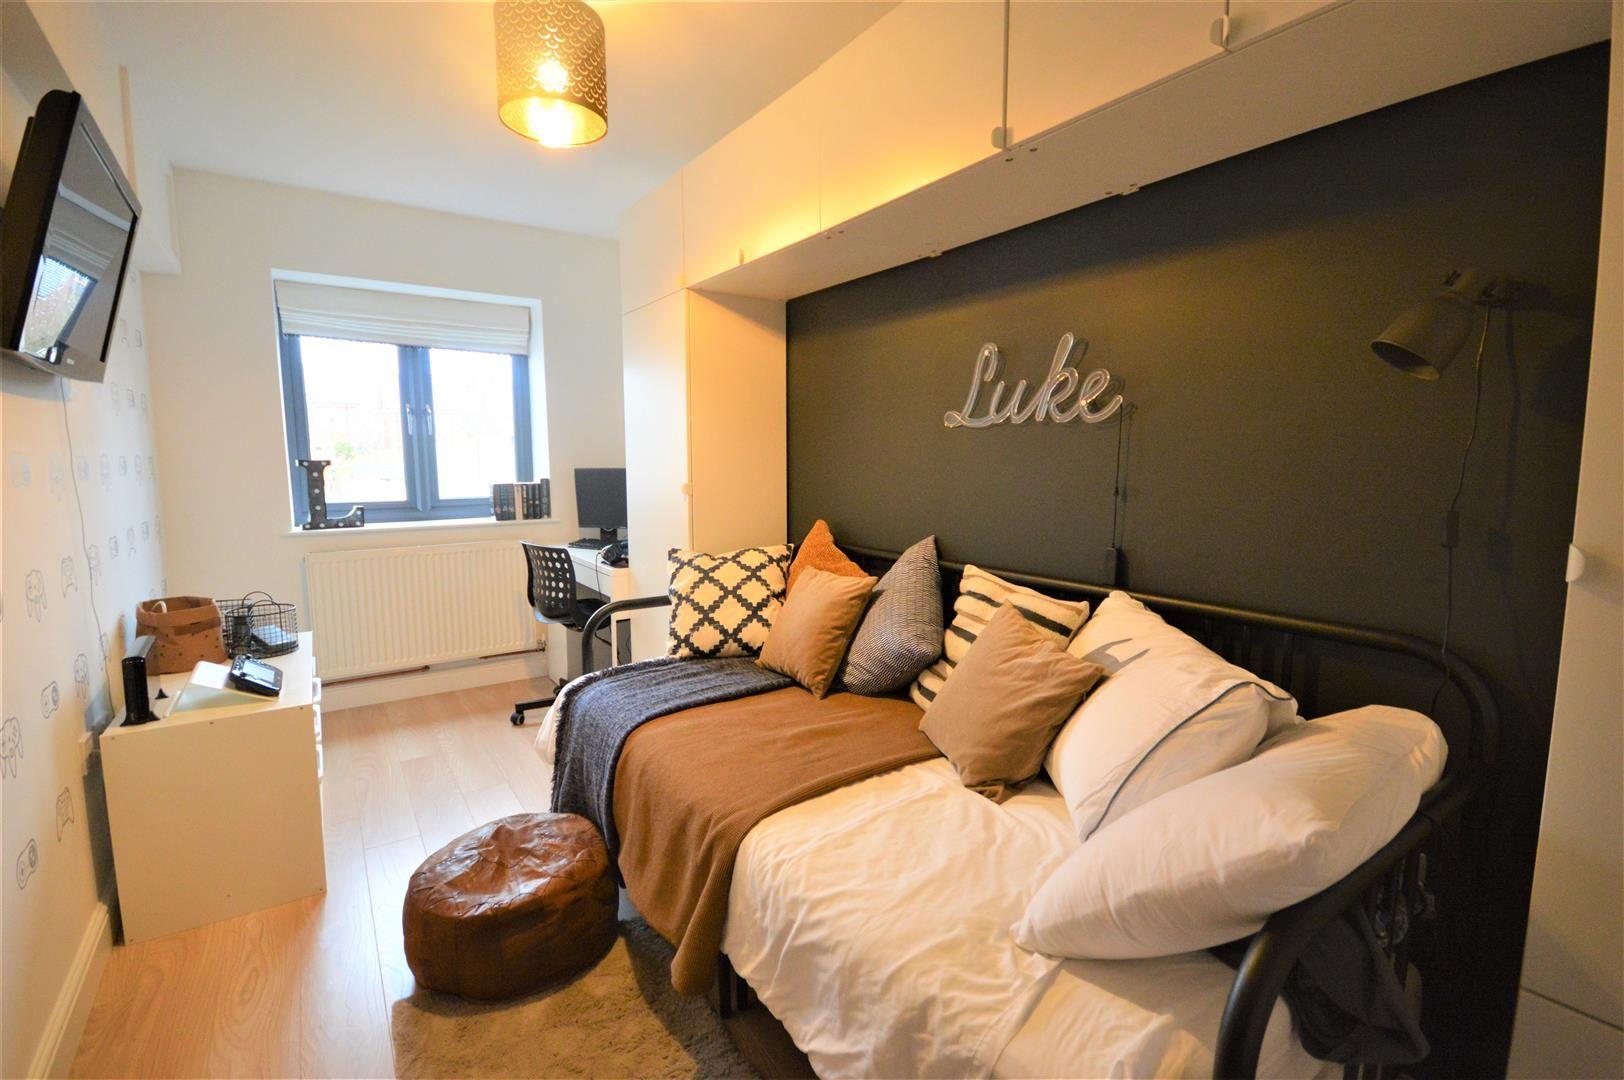 5 bed detached for sale in Leominster 7